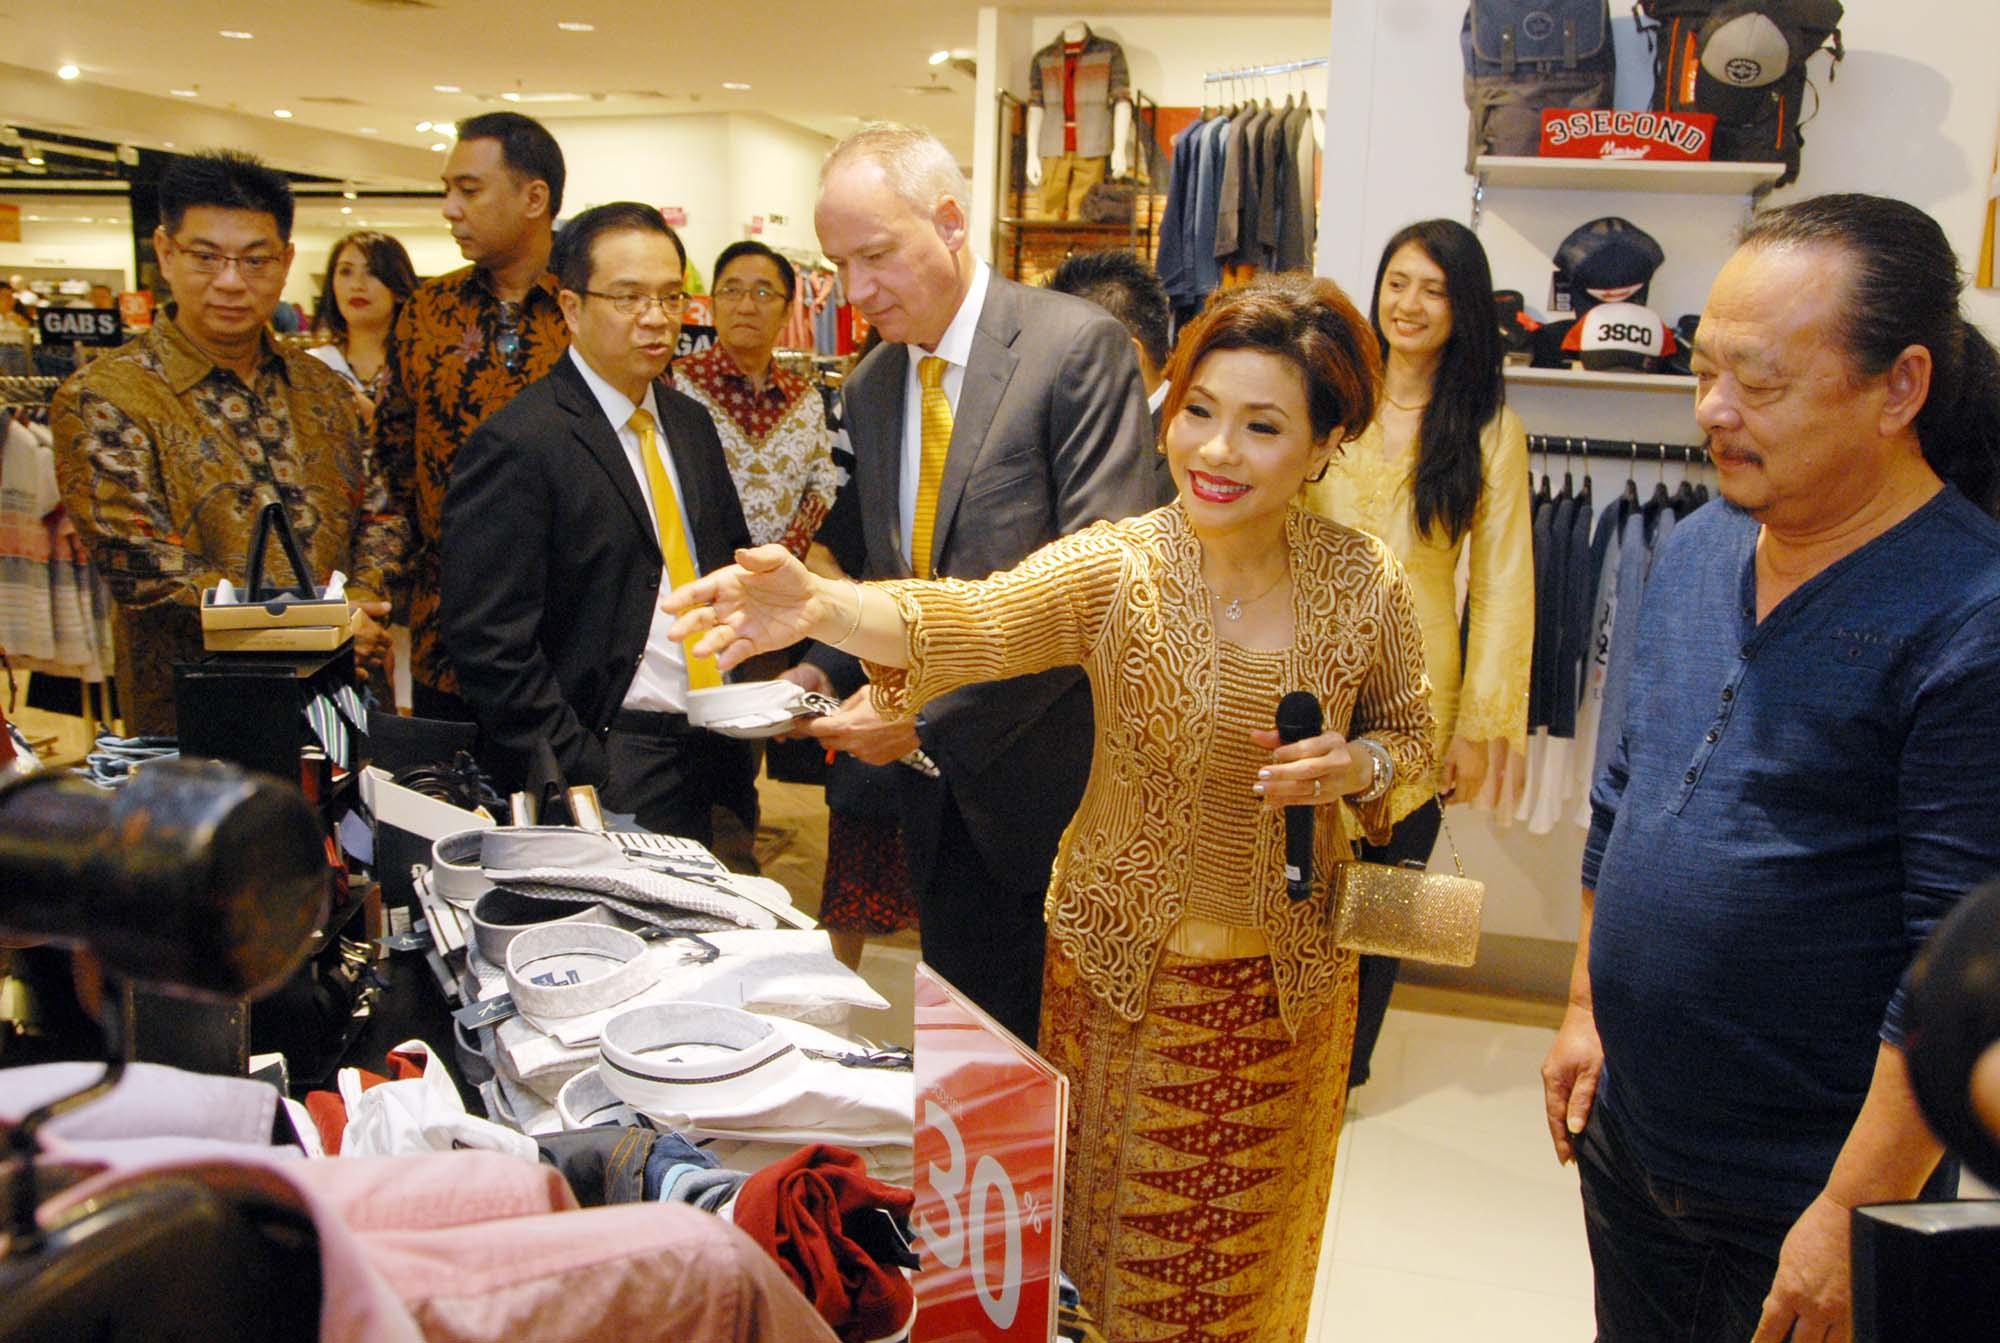 LPPF Penjualan Lesu Imbas Corona - Matahari Departement Merugi Rp 93,95 Miliar | Neraca.co.id